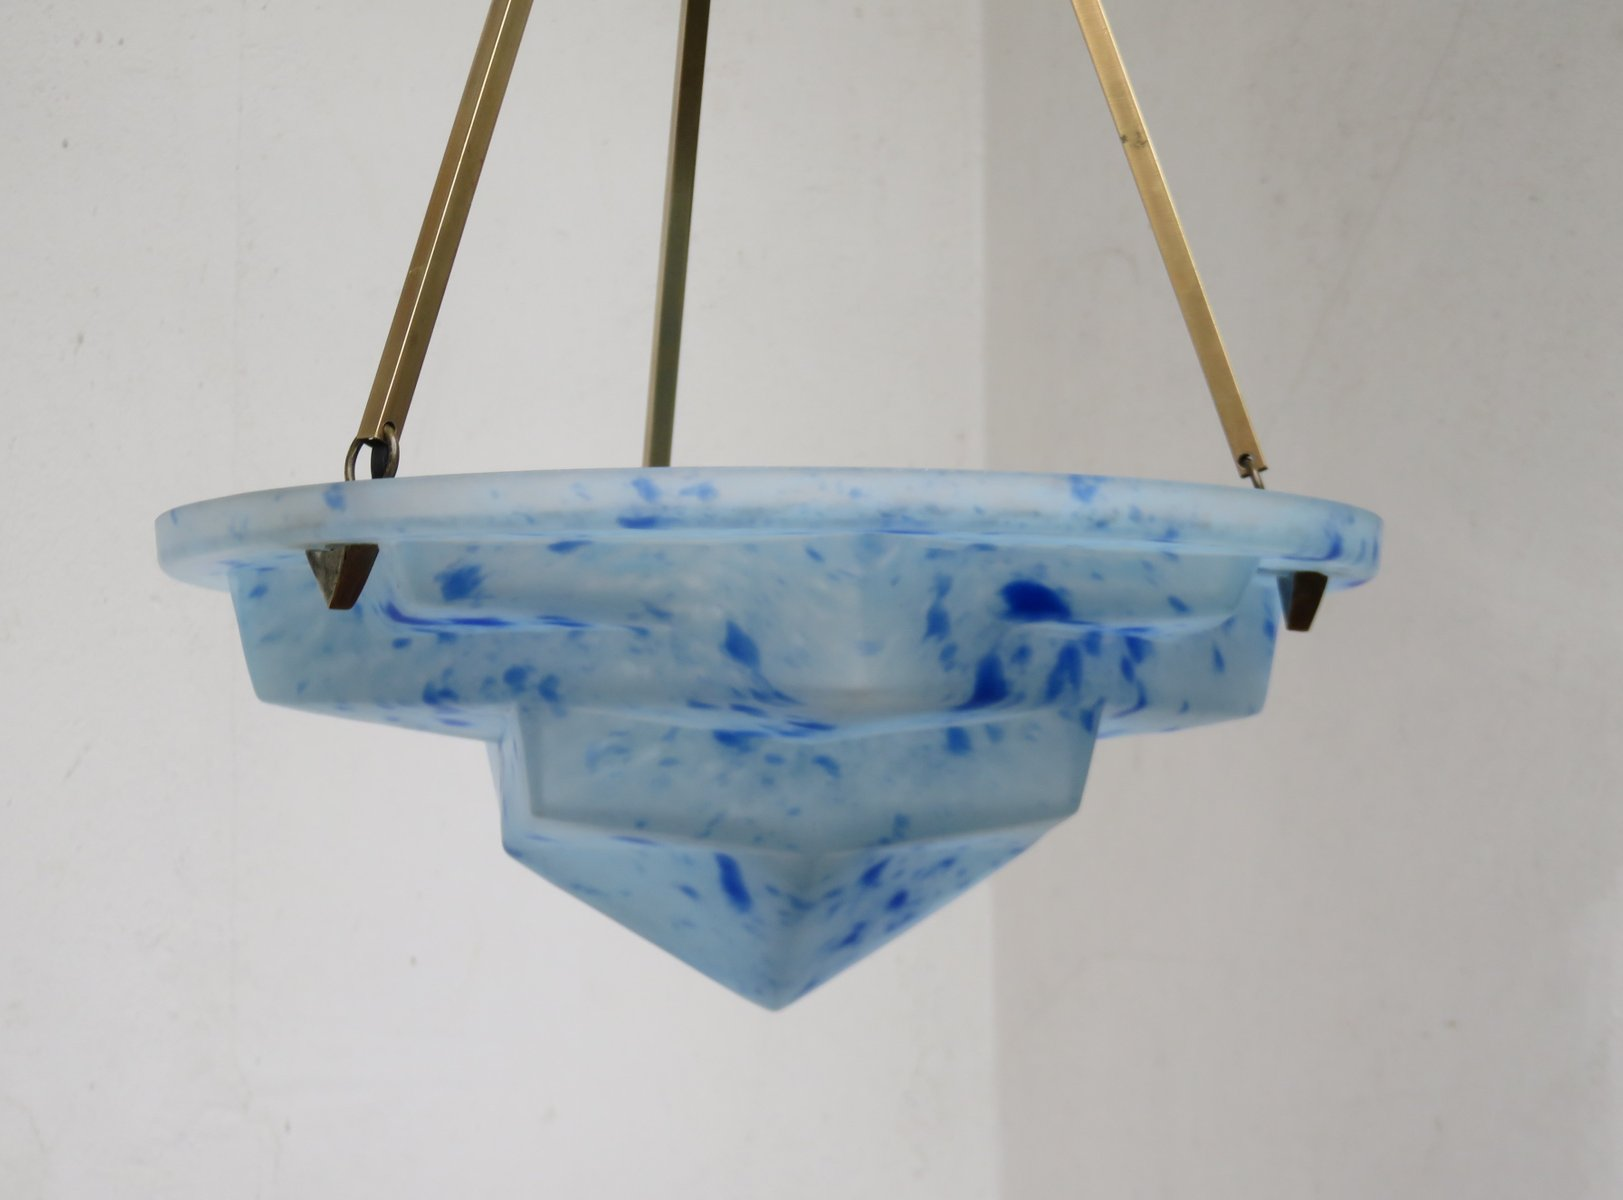 art light img retouch deco ceiling lighting product ceilings